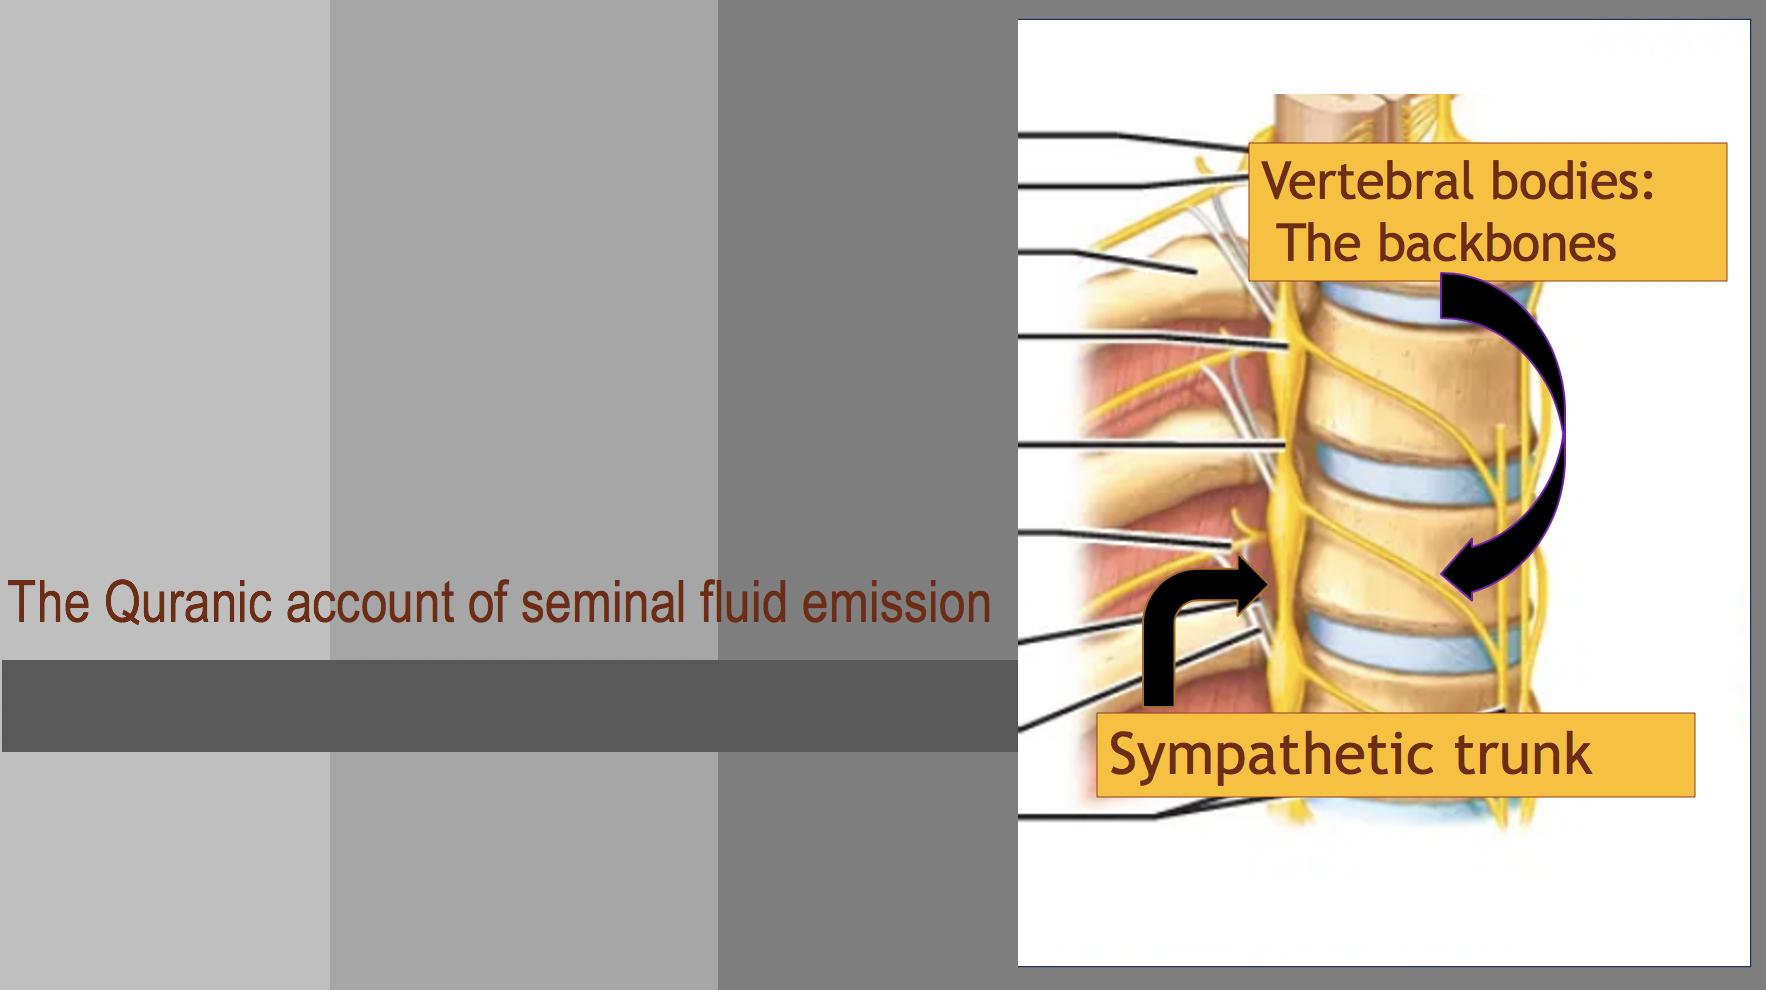 The Quranic account of Seminal fluid Emission